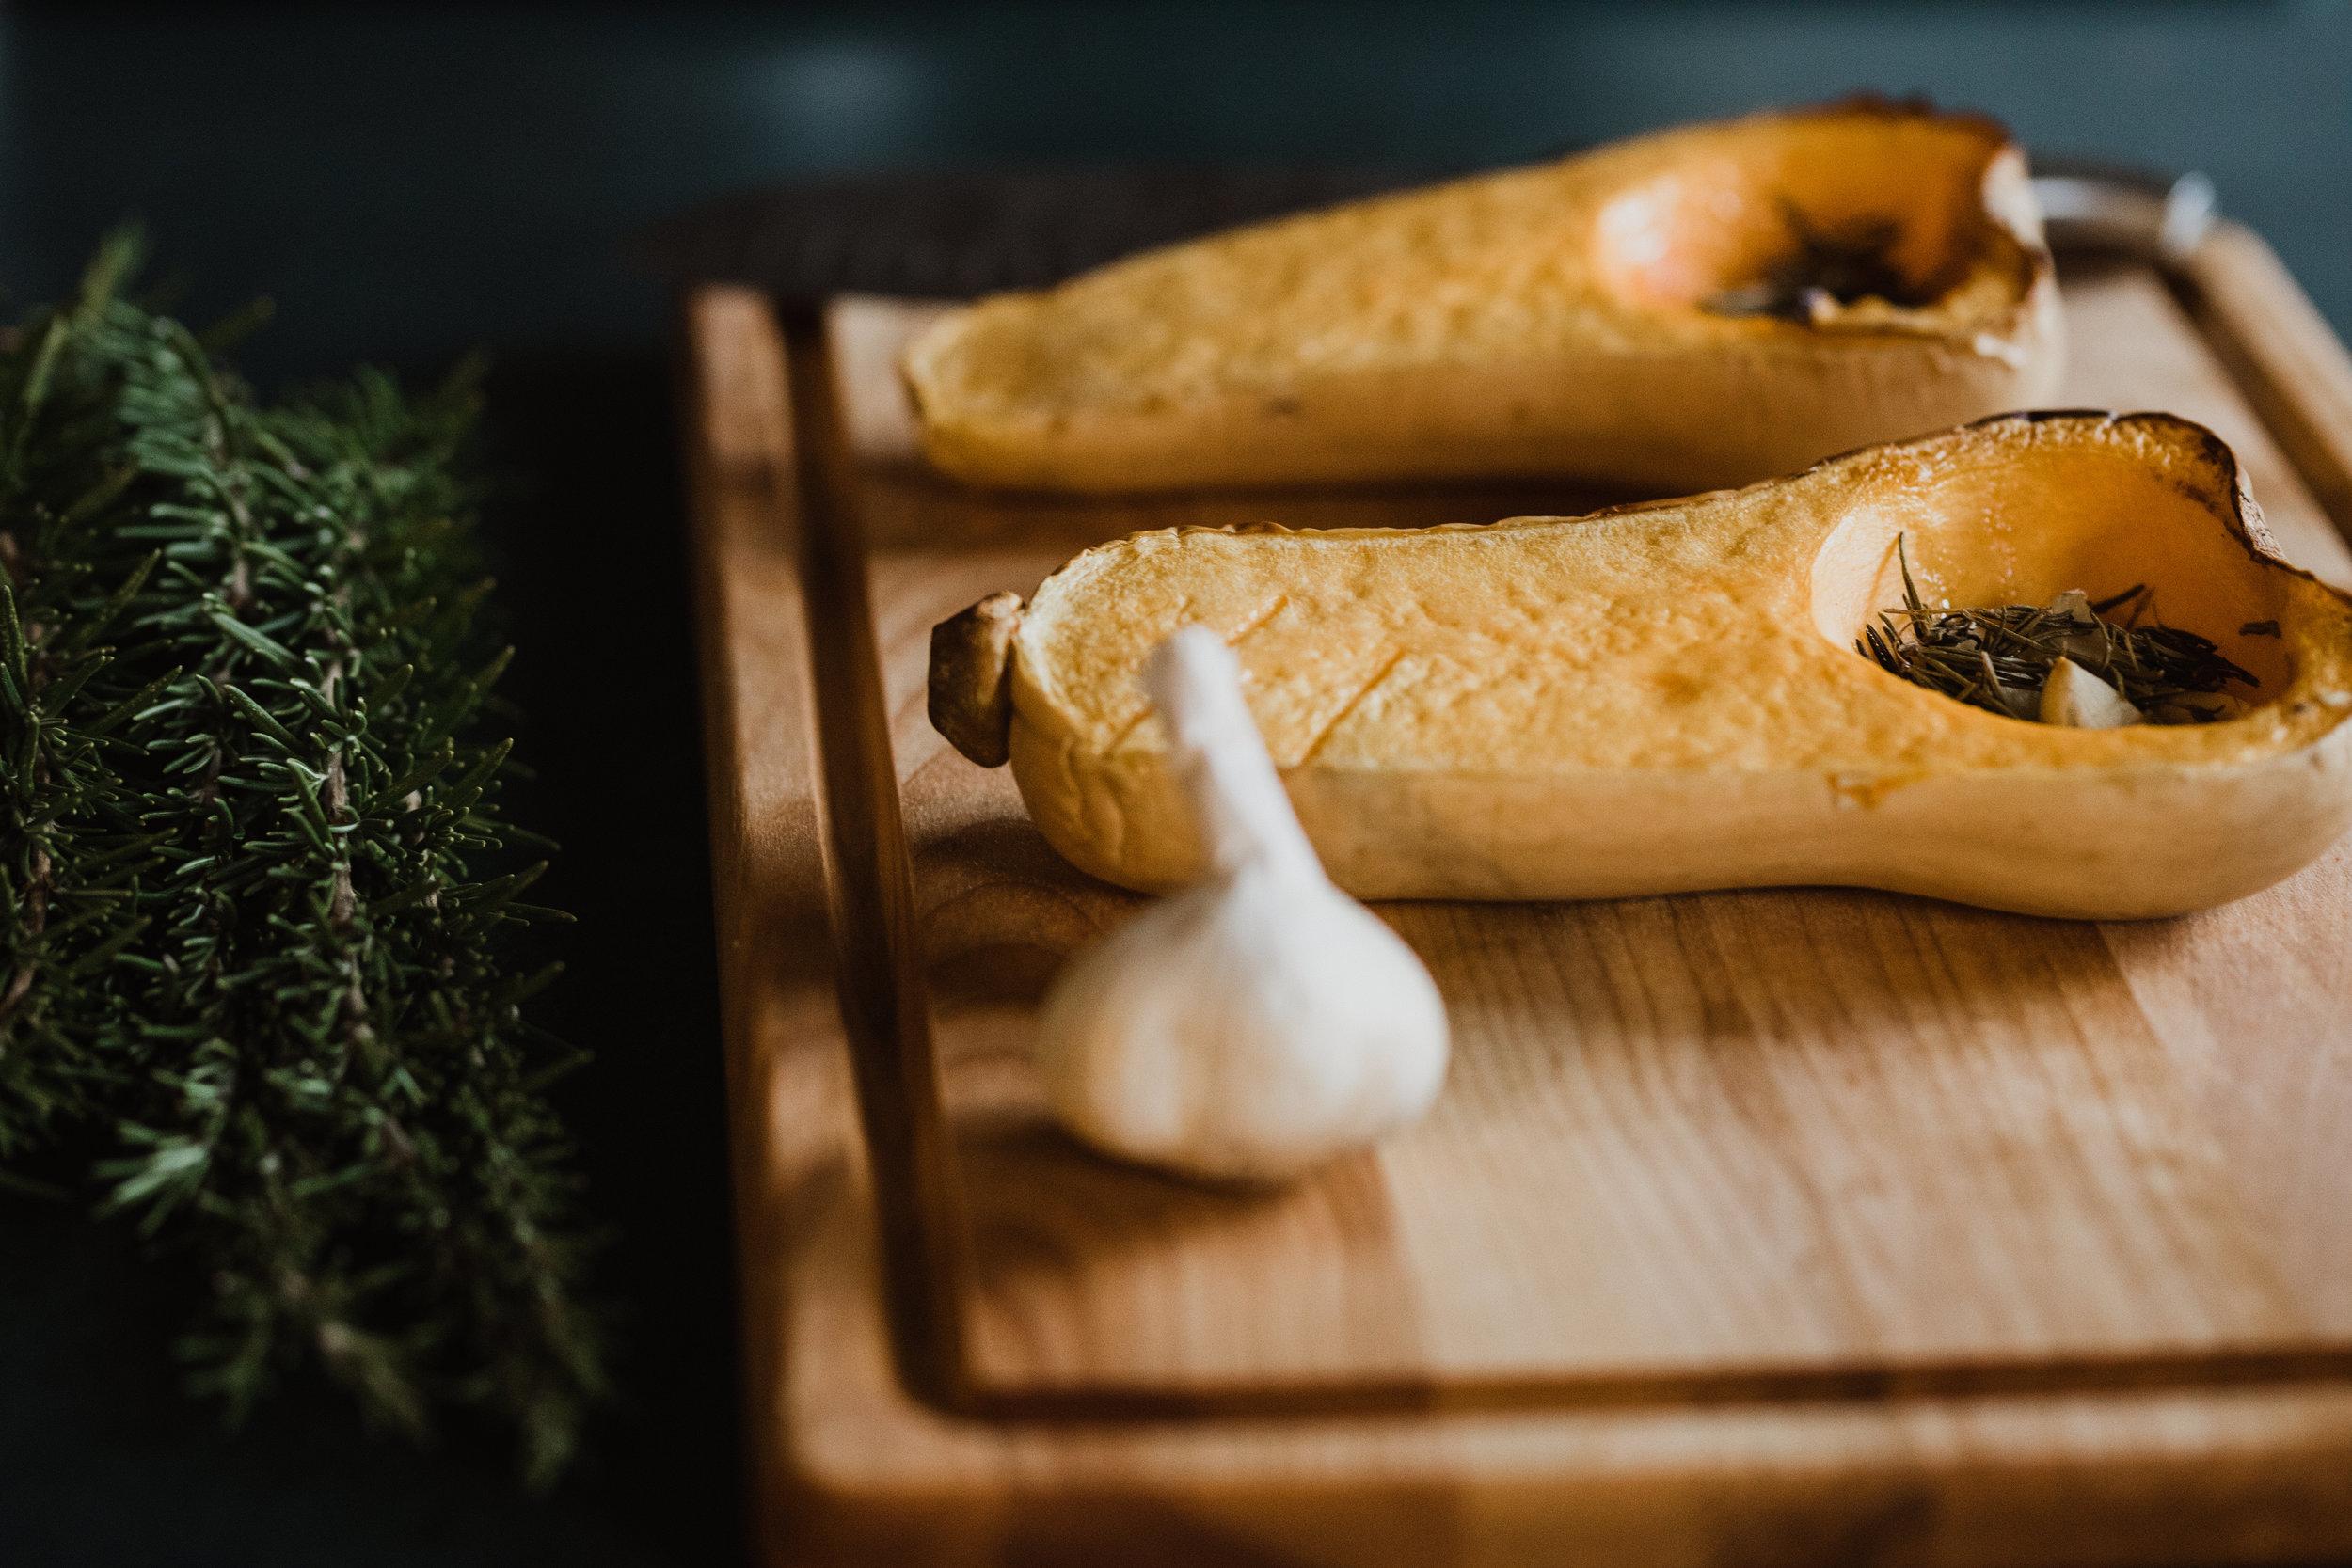 butternut squash and garlic